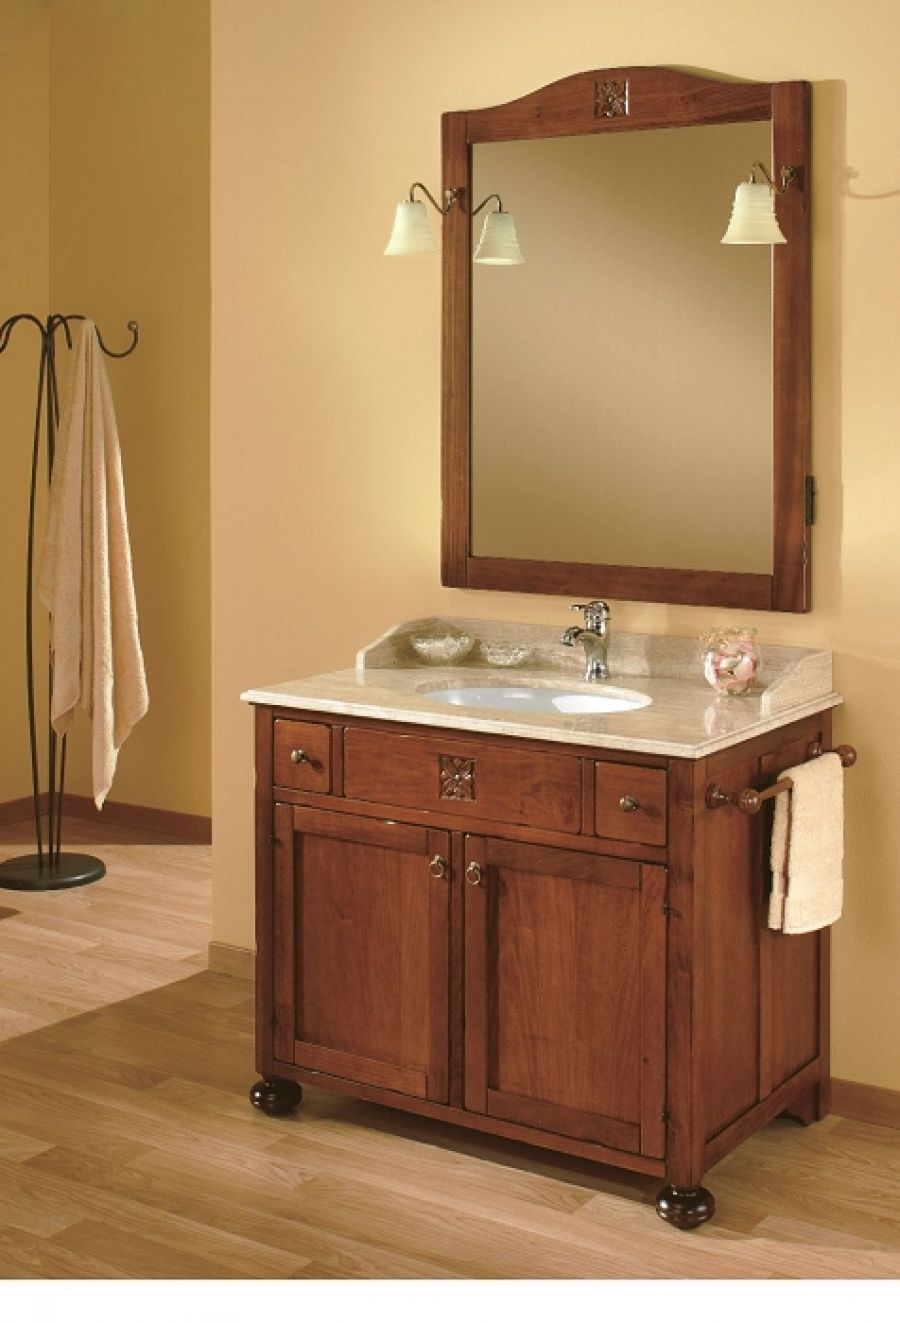 meuble de salle de bain ricordi composition meuble de salle de bain douche. Black Bedroom Furniture Sets. Home Design Ideas